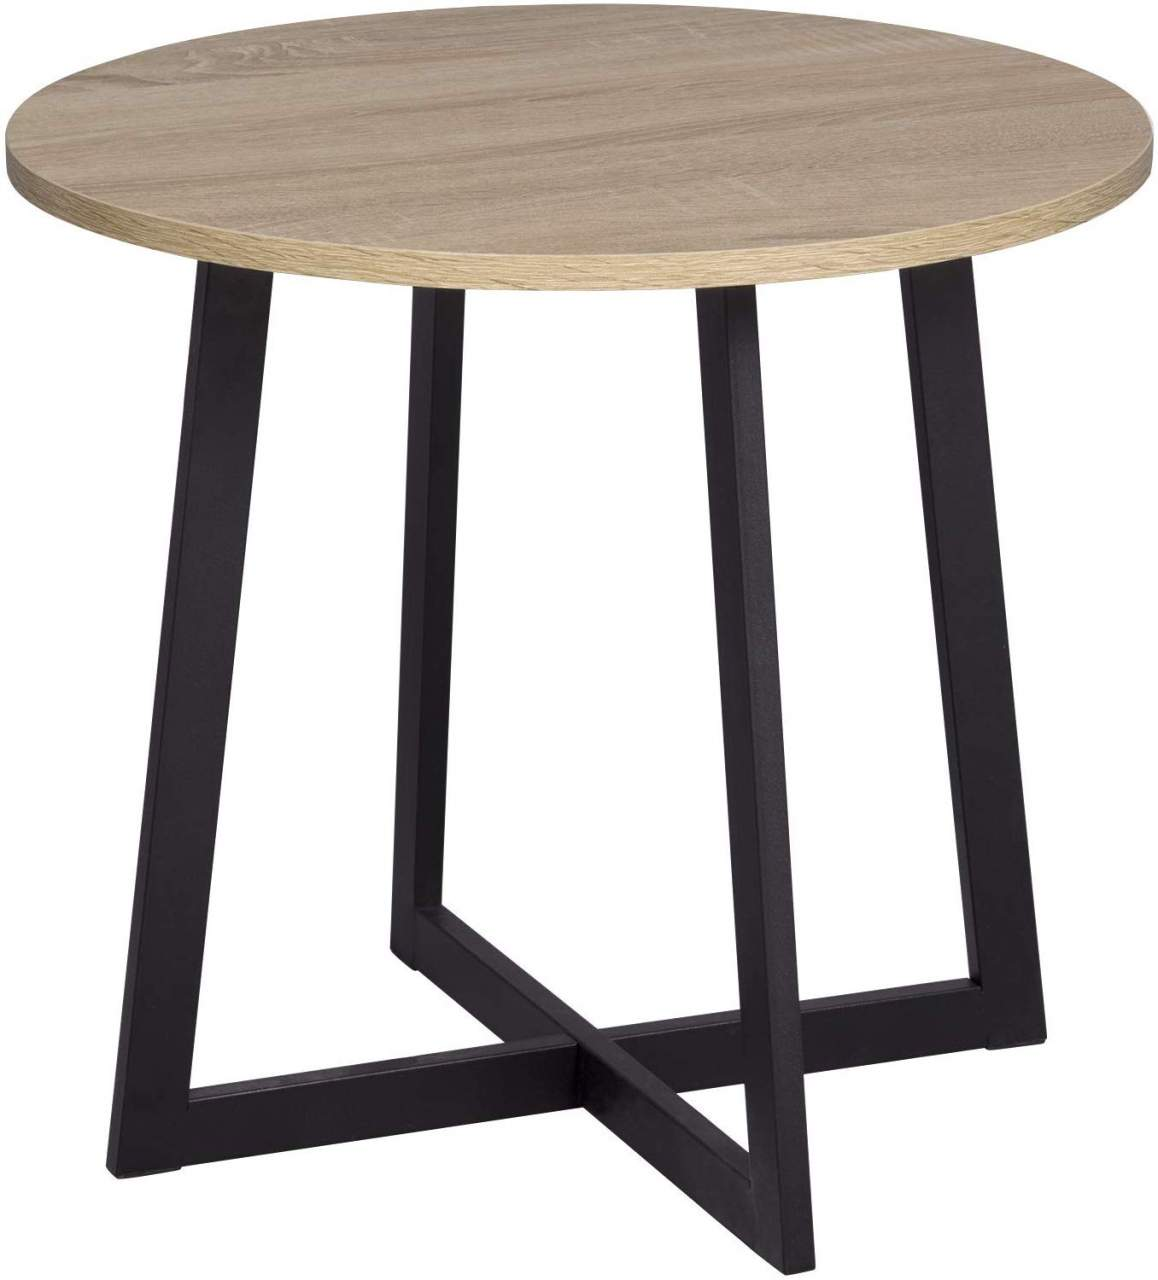 Full Size of Big Sofa Nadja Side Table Model Woltueu L Form Lederpflege Polyrattan Rotes Muuto Modernes Natura Boxspring Kaufen Mit Schlaffunktion Rahaus Stressless Wohnzimmer Big Sofa Nadja